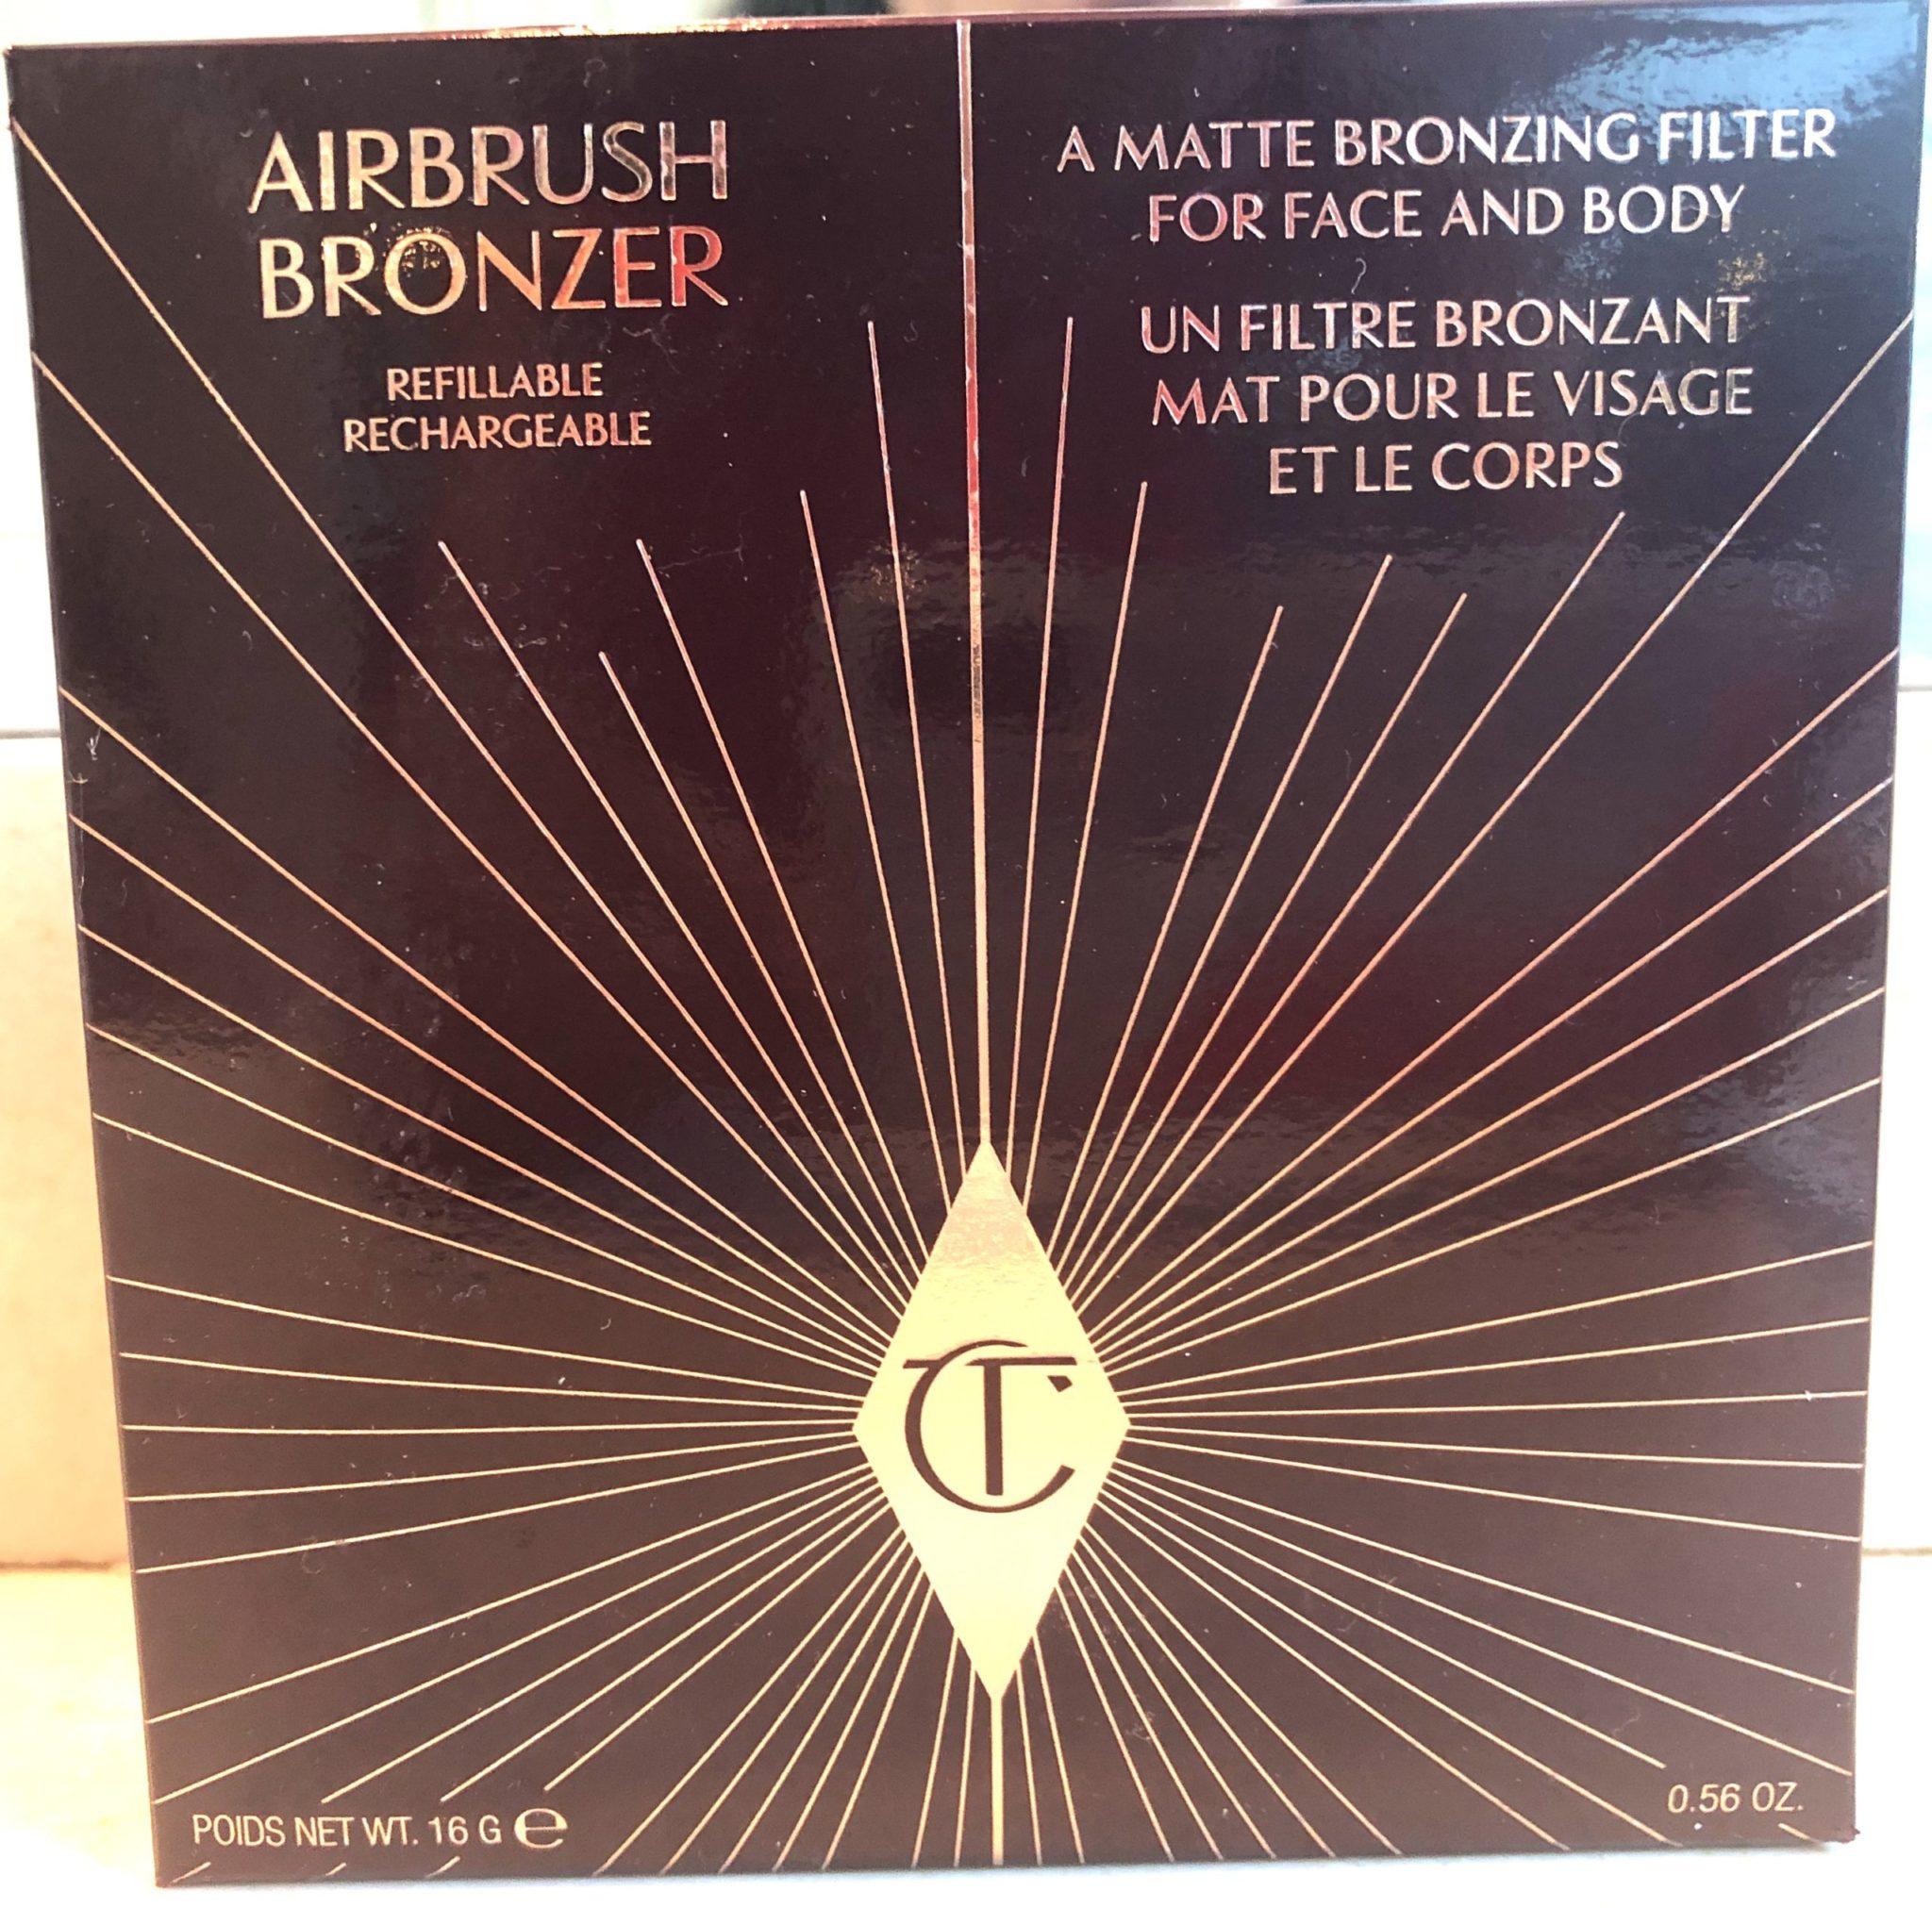 CHARLOTTE TILBURY AIRBRUSH BRONZER OUTER BOX